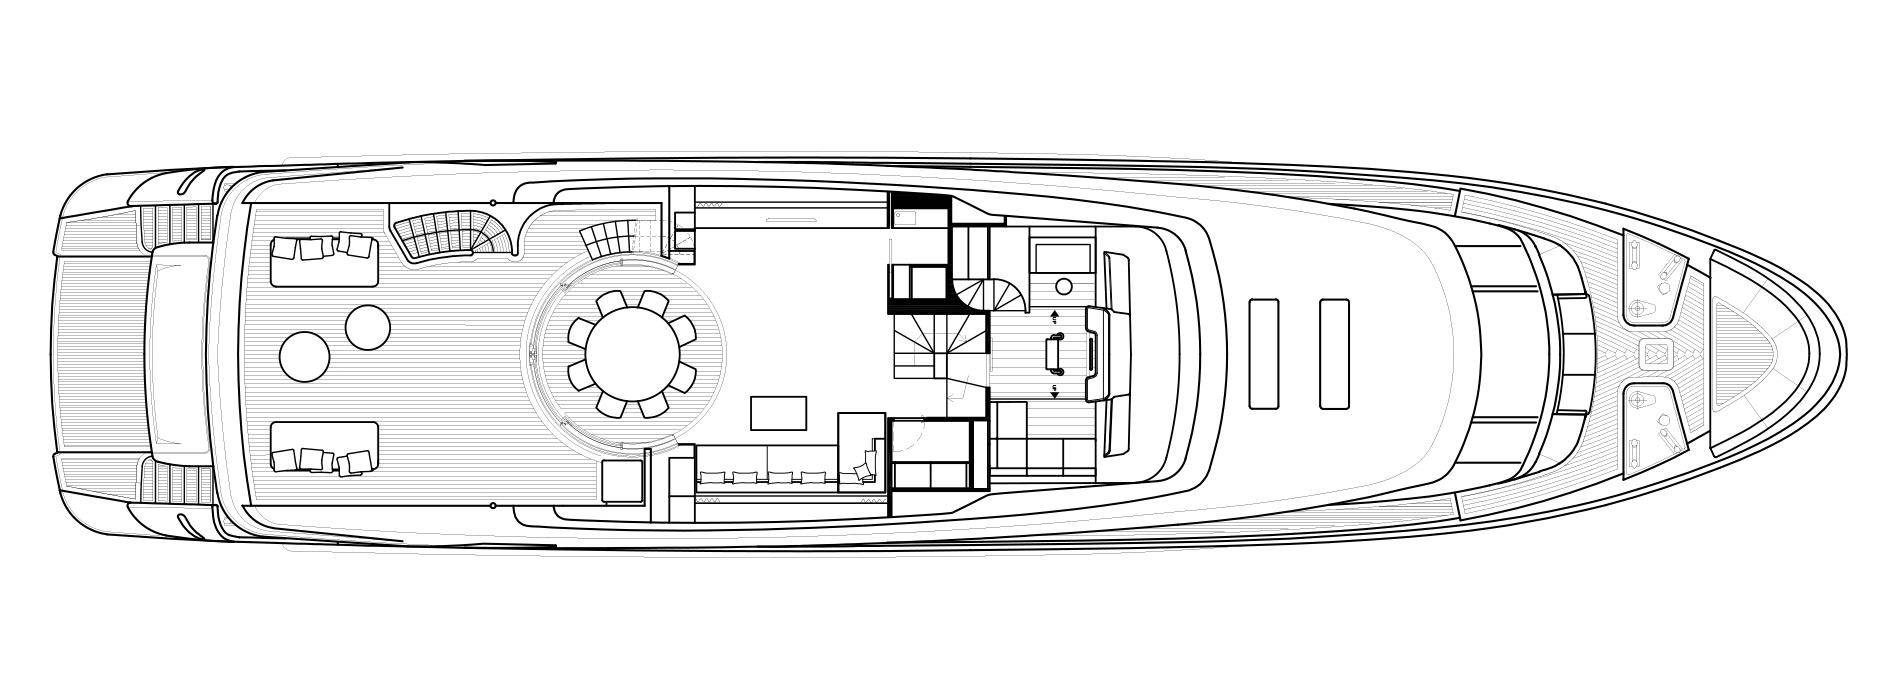 Sanlorenzo Yachts SD112 Oberdeck Versione B